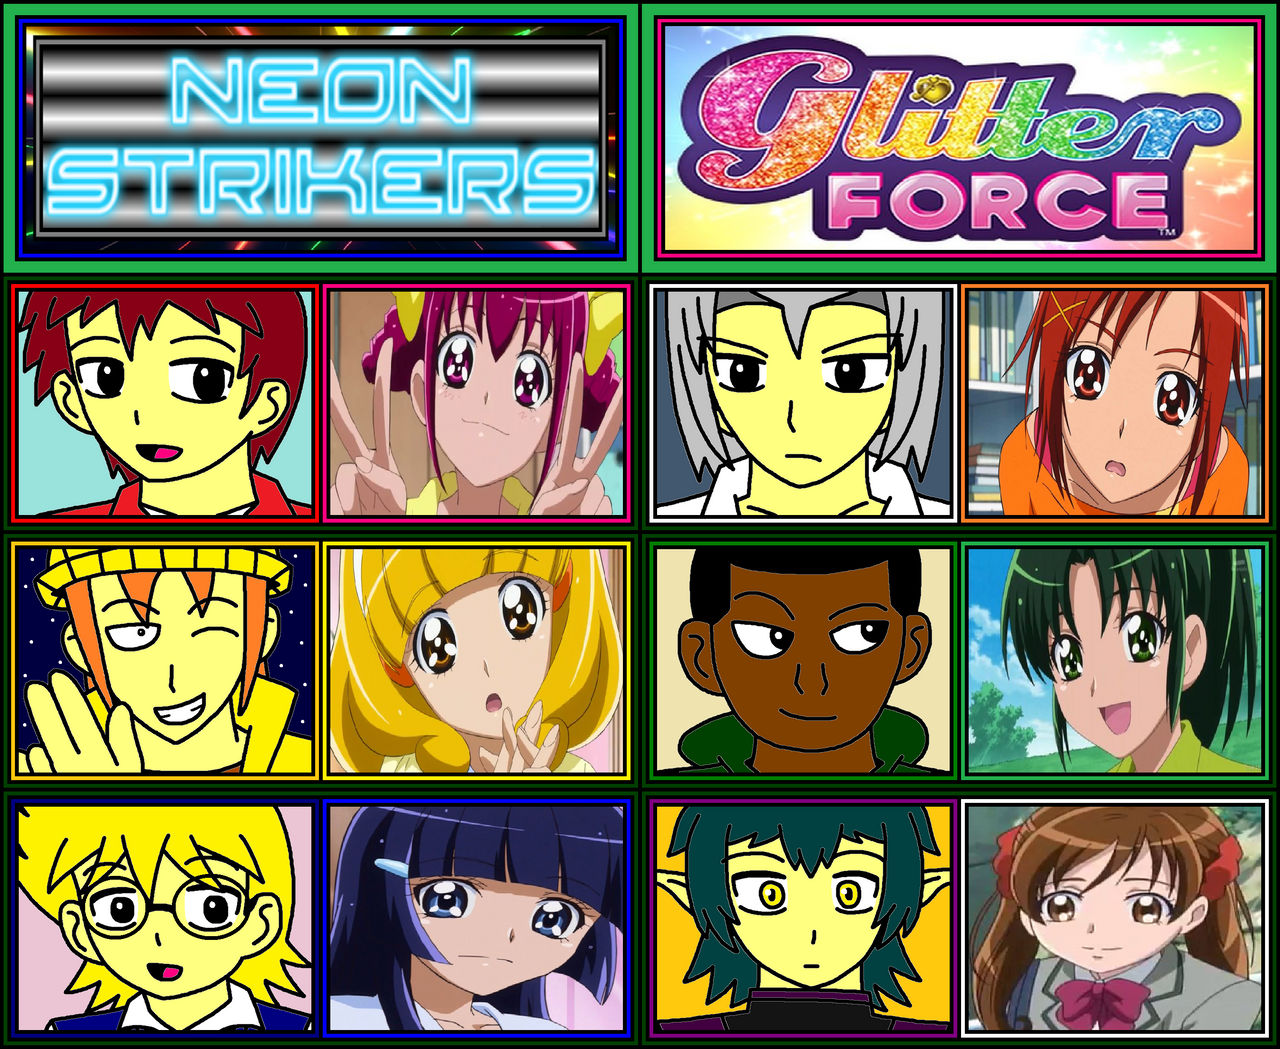 Neon Strikers X Glitter Force Main Characters By Ian2x4 On Deviantart